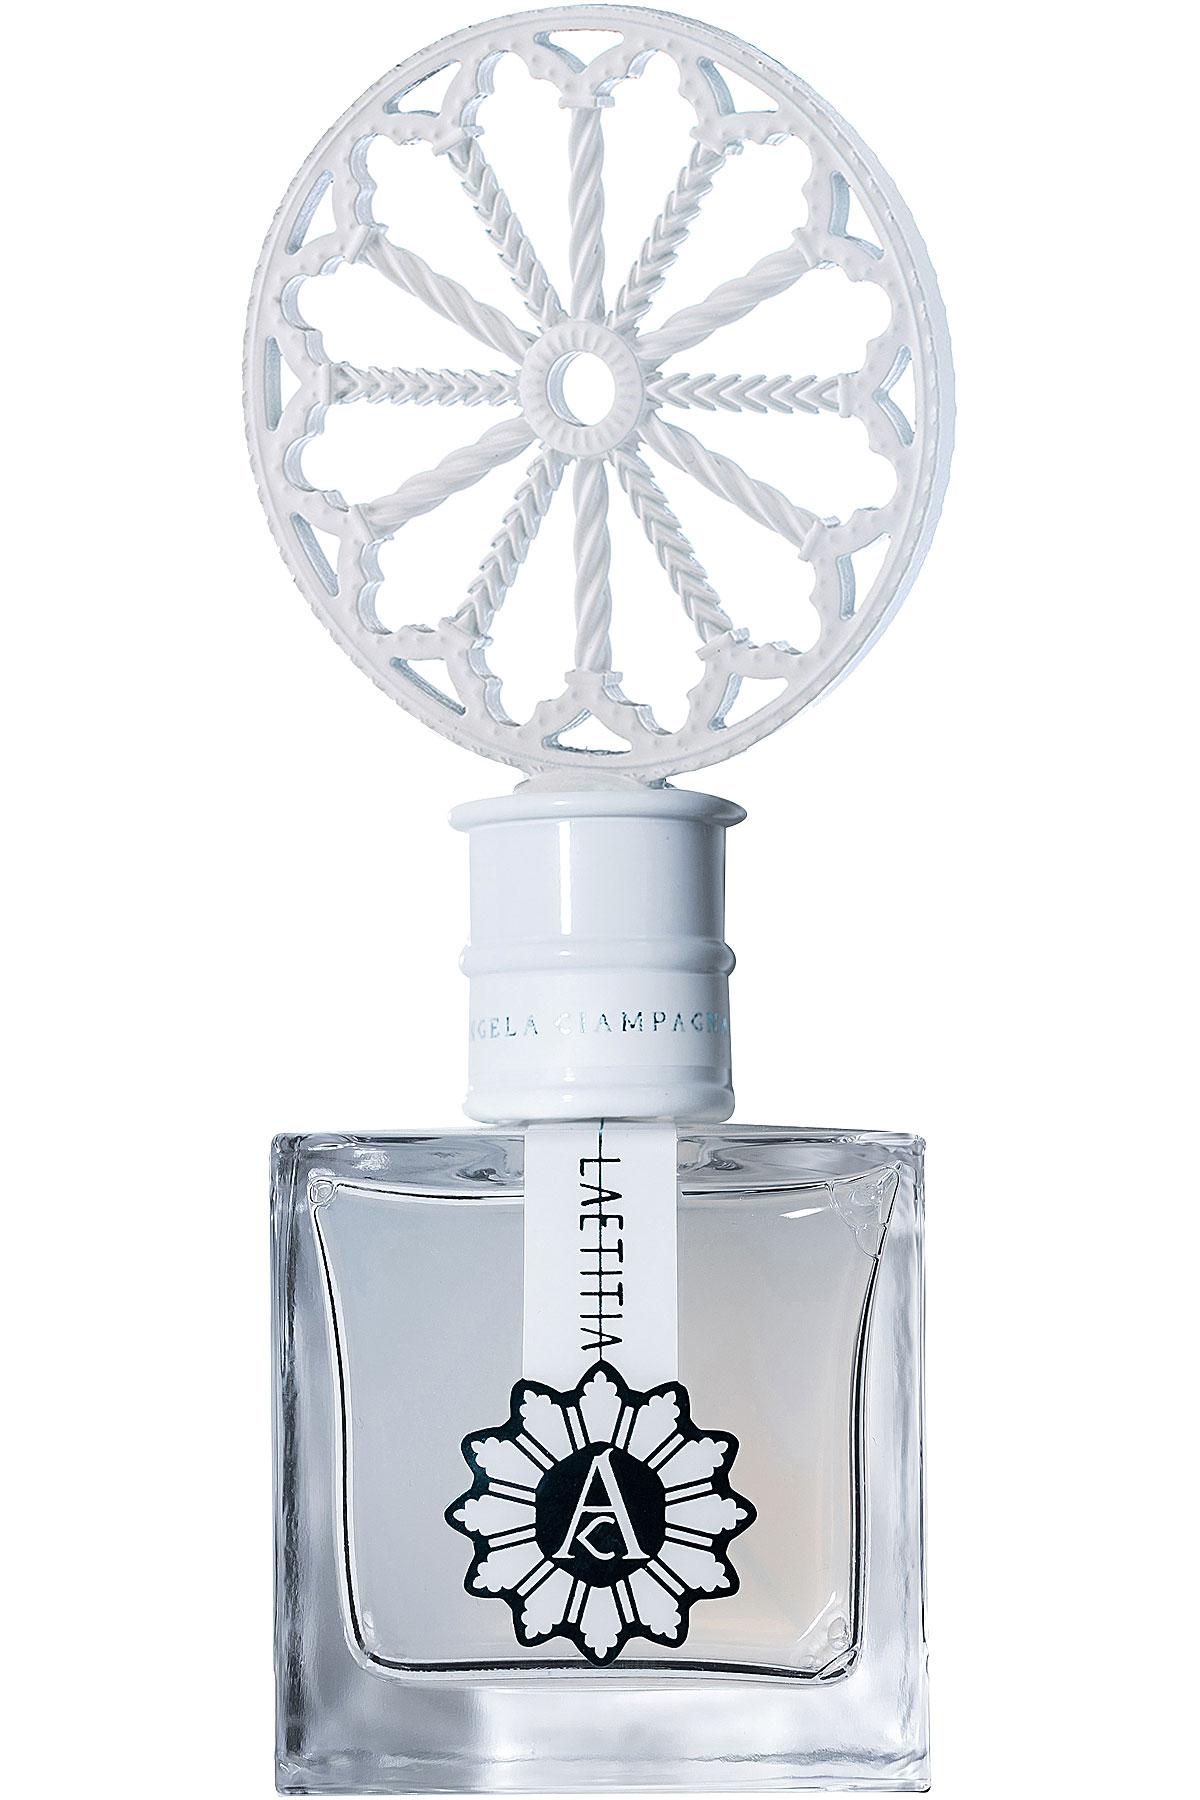 Angela Ciampagna Fragrances for Women, Laetitia - Scented Water - 100 Ml, 2019, 100 ml